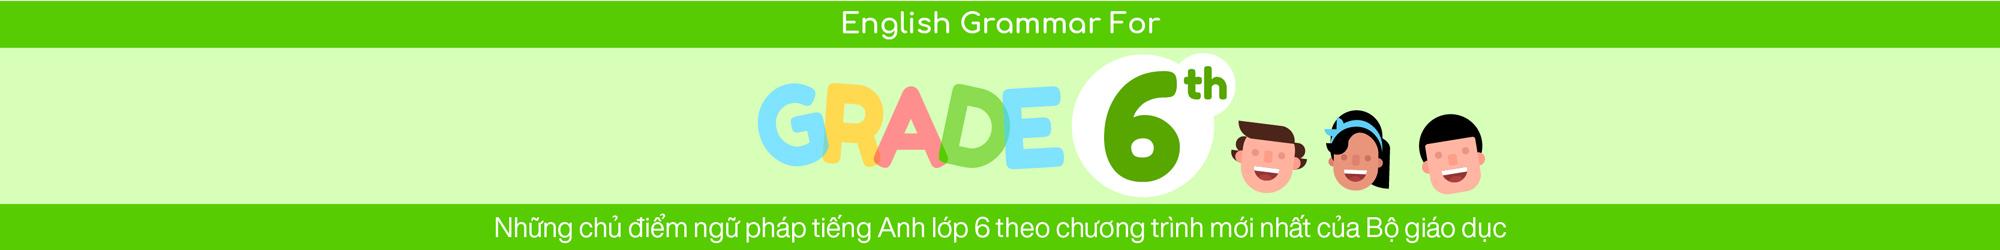 ENGLISH GRAMMAR FOR 6TH GRADE banner